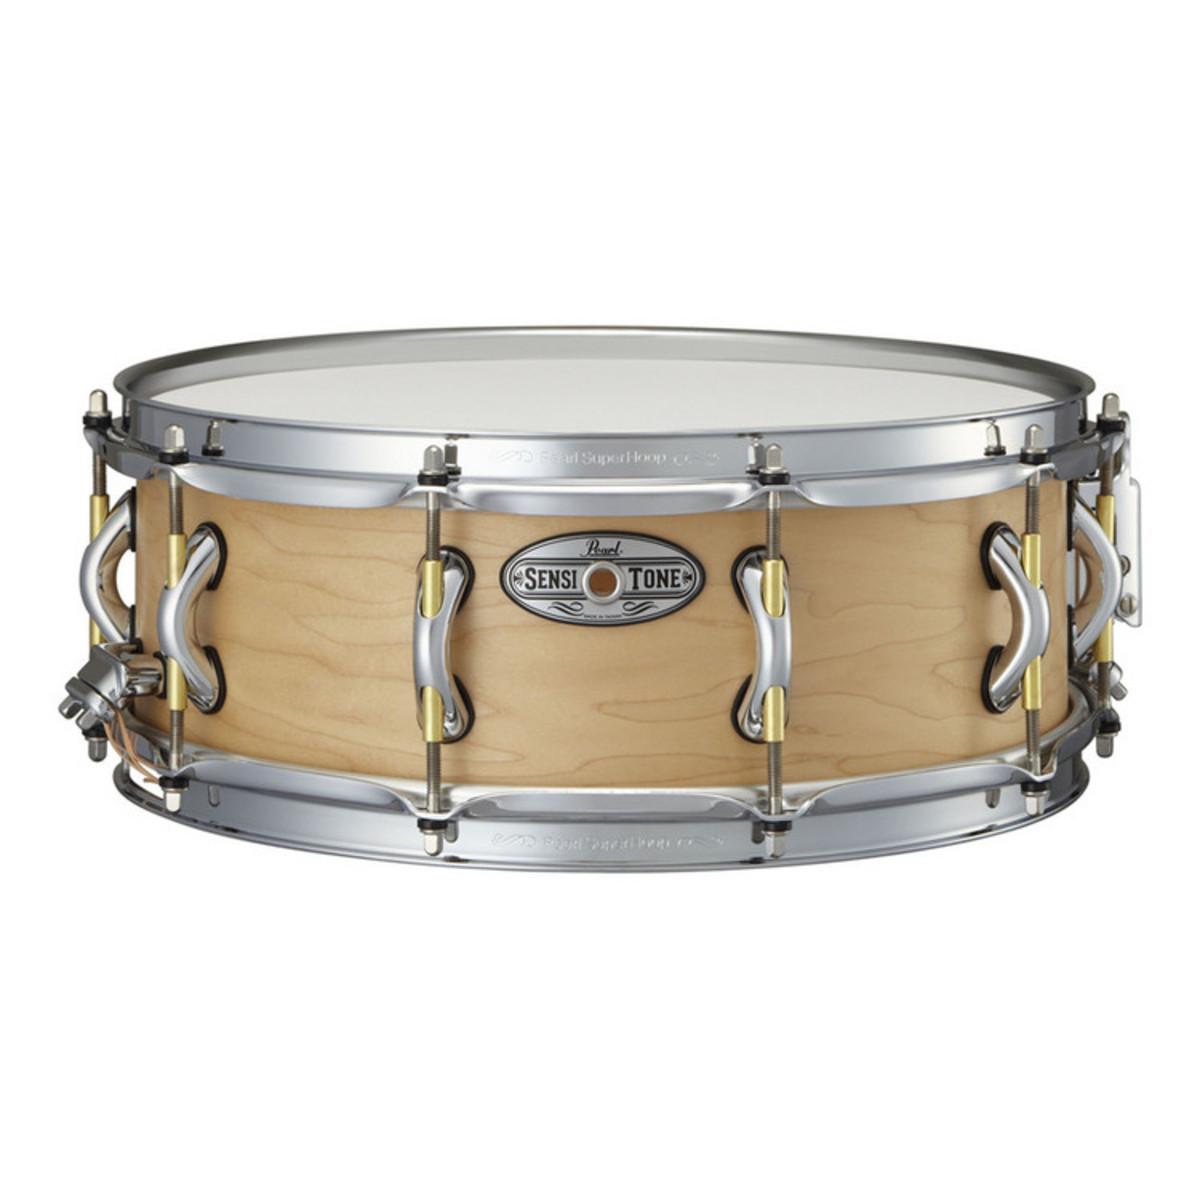 pearl sensitone premium 14 39 39 x 5 39 39 snare drum maple at gear4music. Black Bedroom Furniture Sets. Home Design Ideas